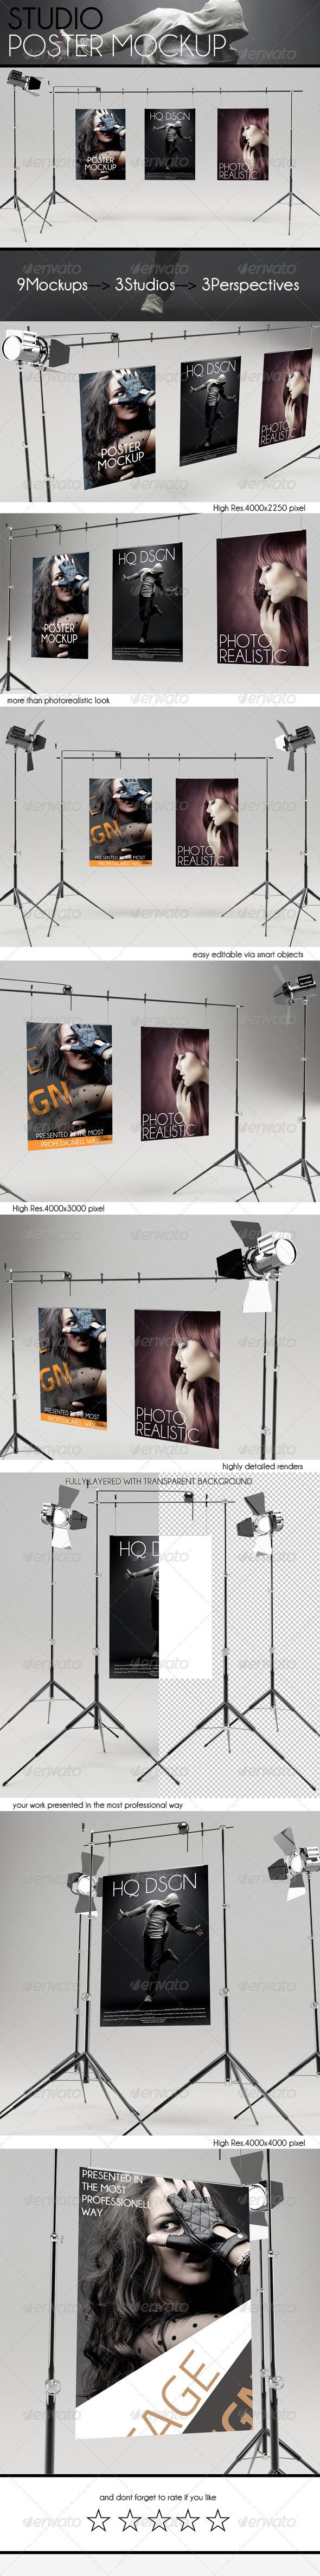 P251 - لایه باز پکیج عظیم موکاپ استدیویی حرفه ای psd فوق العاده